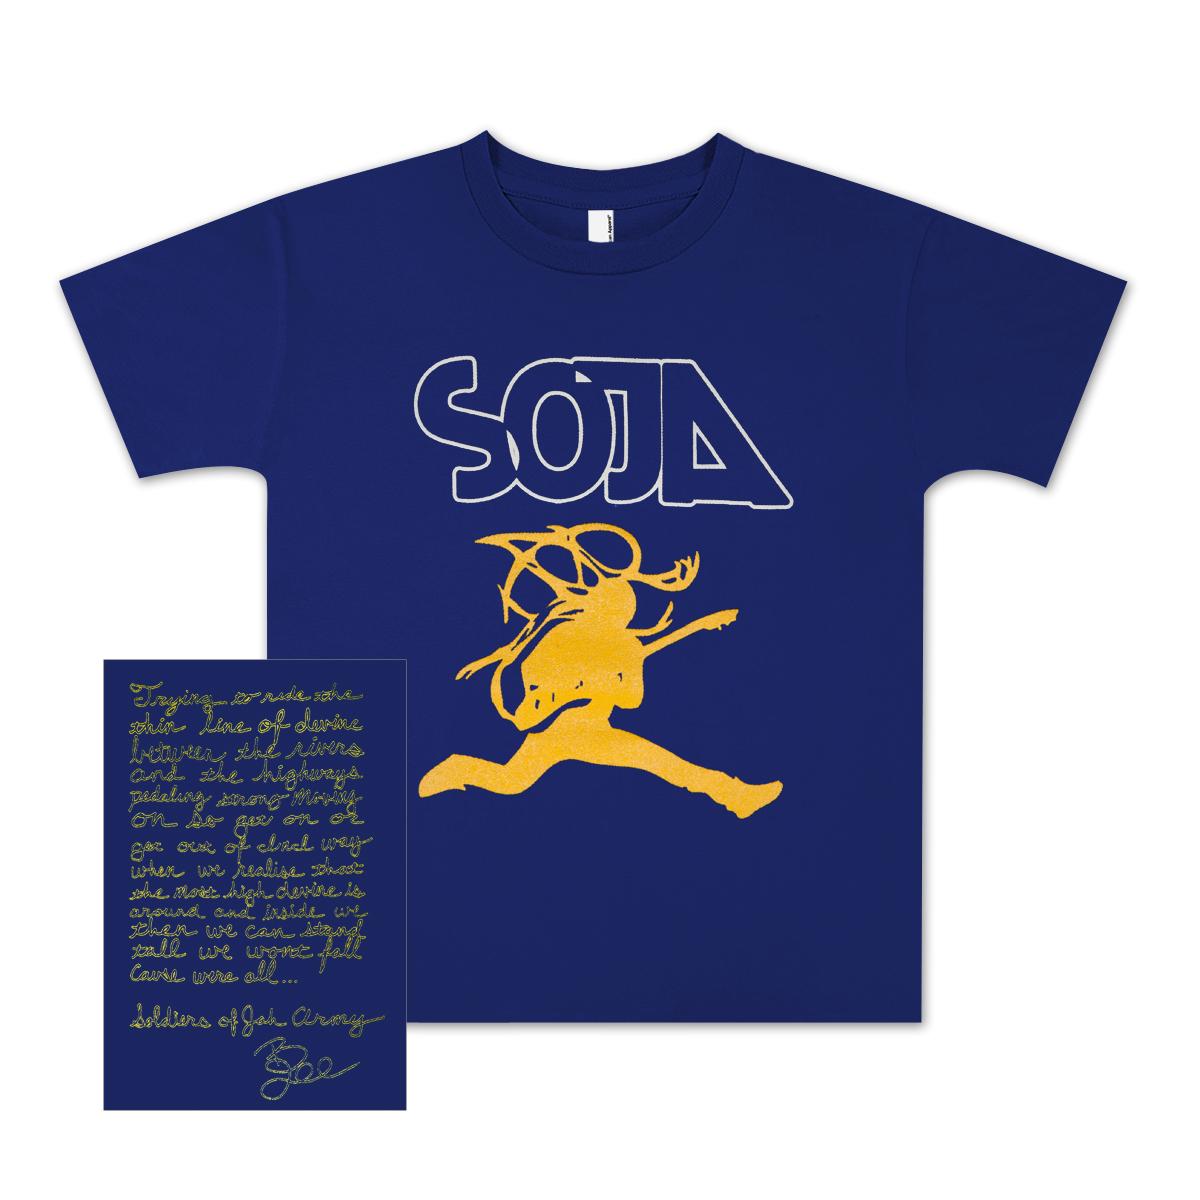 SOJA - Bobby Lee Jumpman Kids T-Shirt